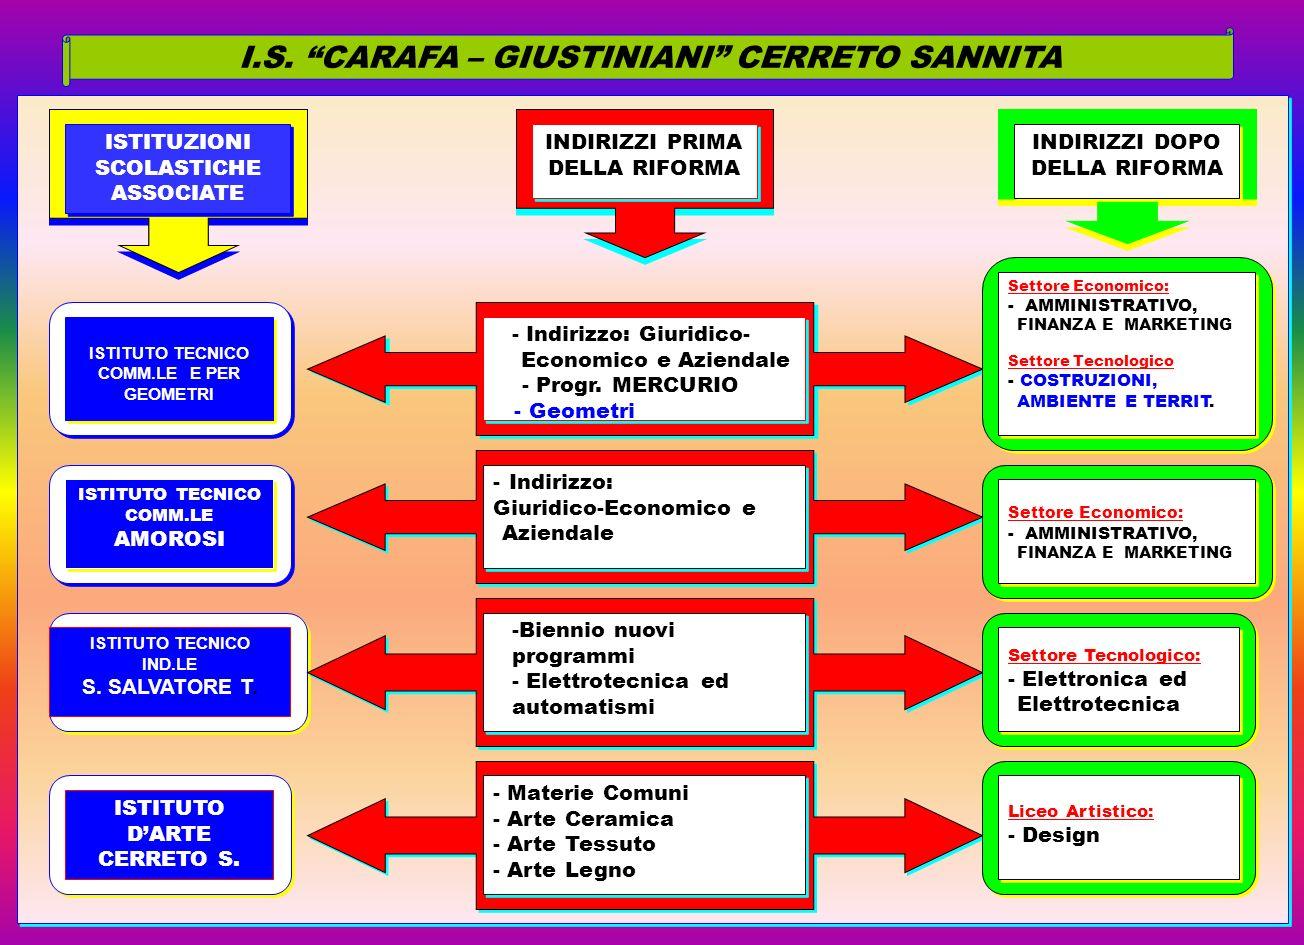 I.S. CARAFA – GIUSTINIANI CERRETO SANNITA